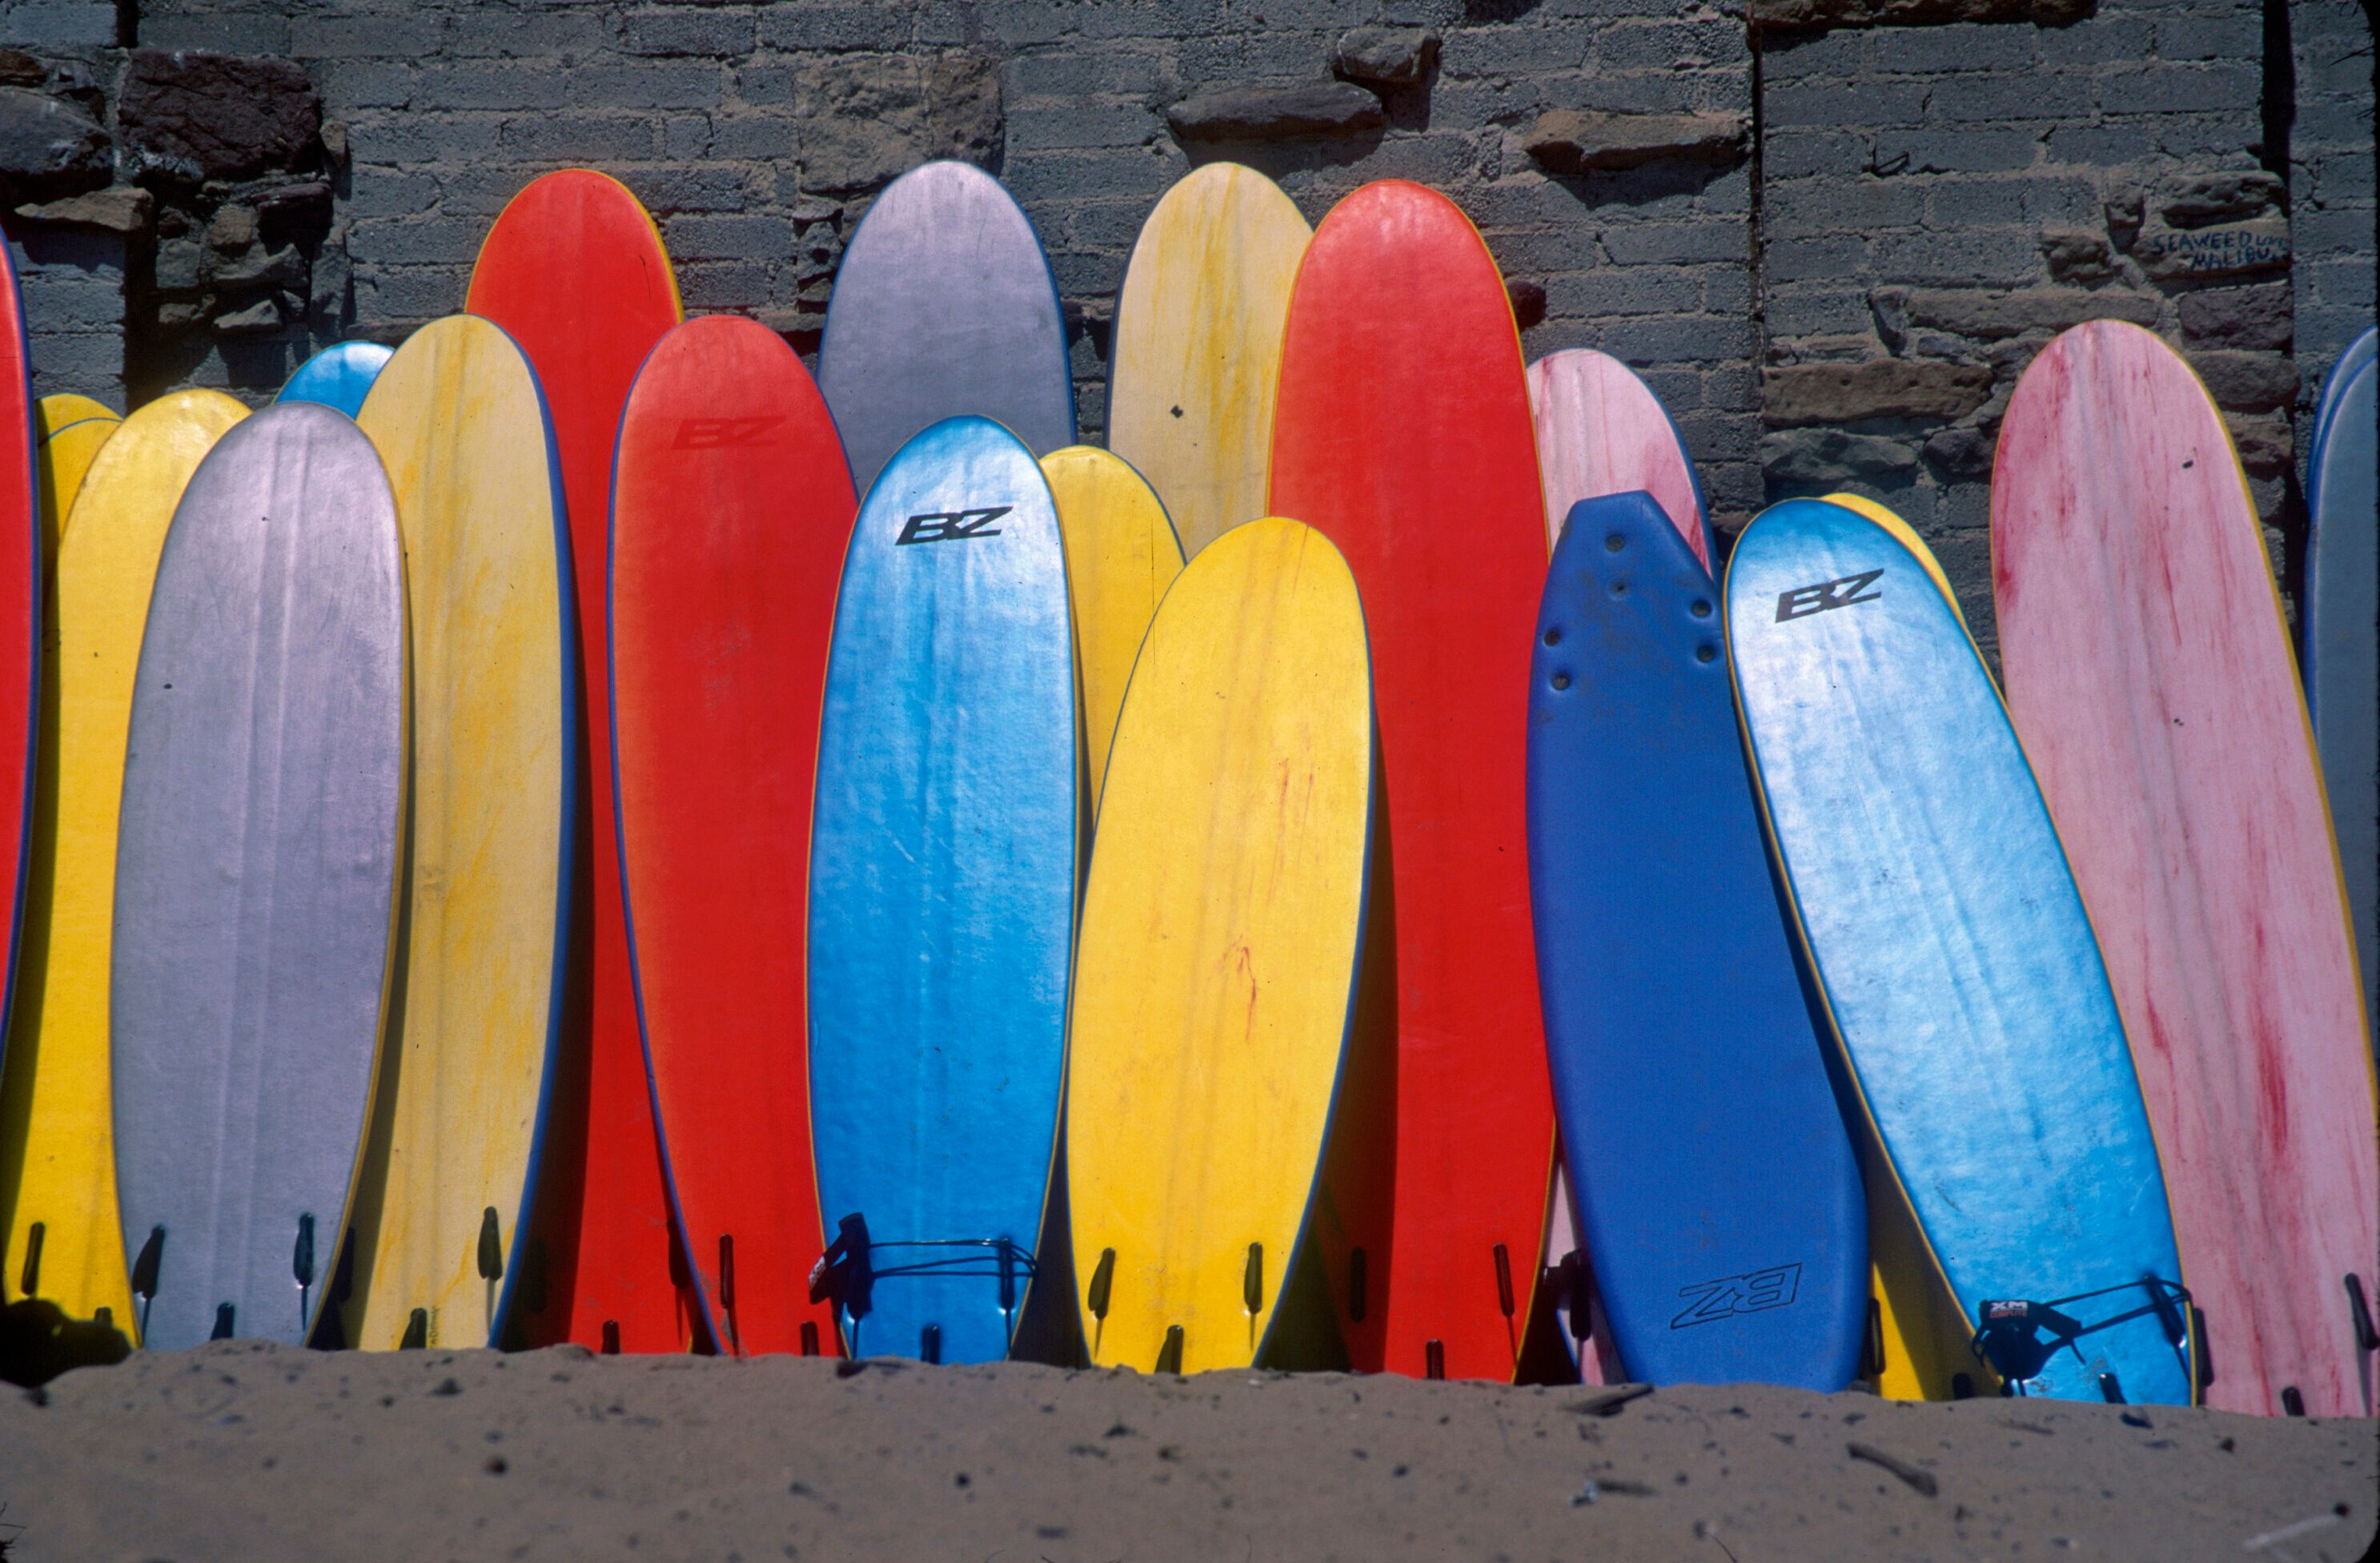 Surfboards, Malibu, California